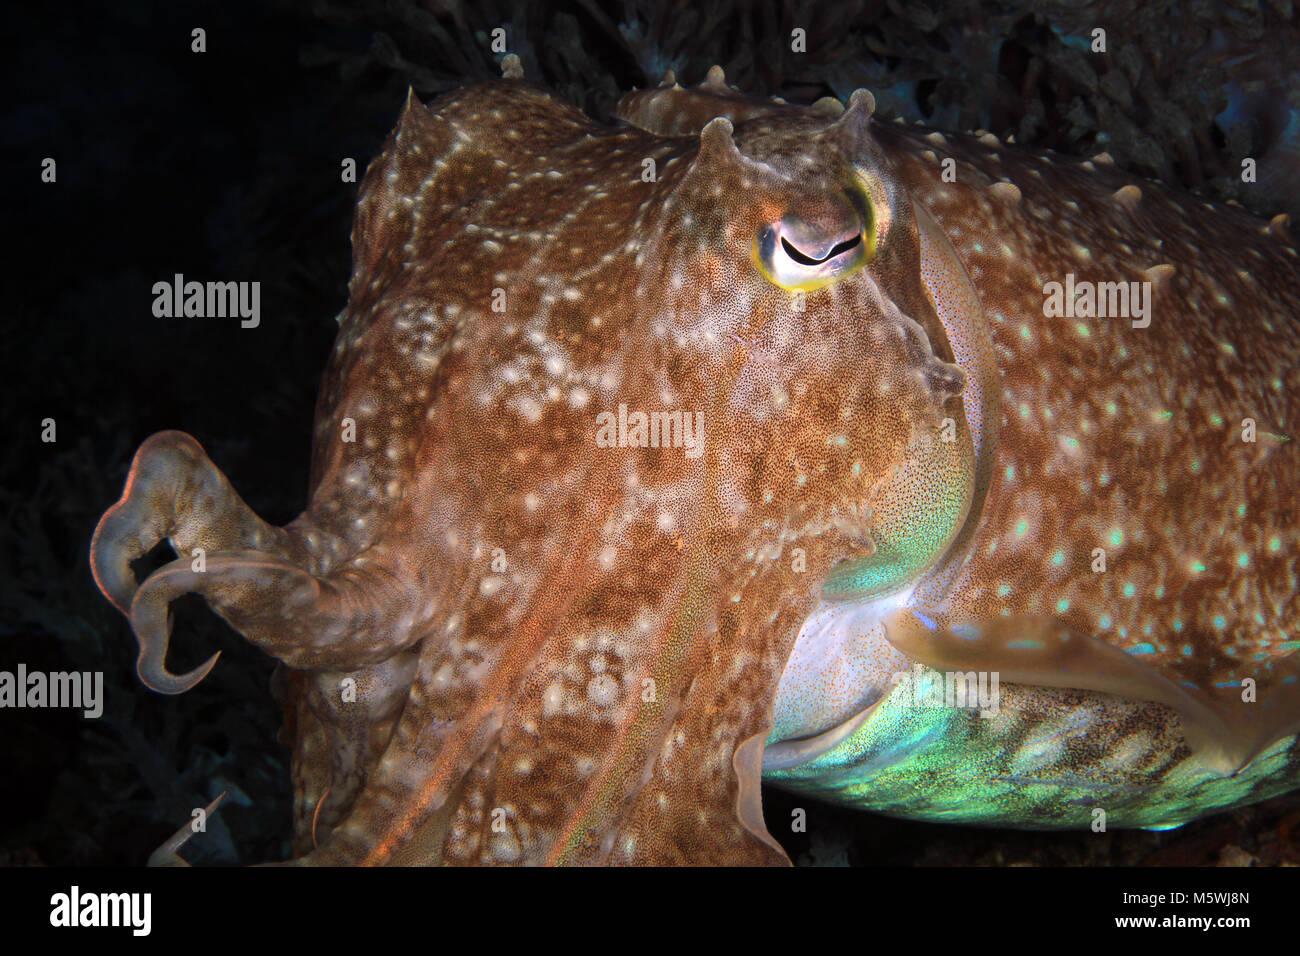 Close-up of a Broadclub Cuttlefish (Sepia latimanus). Anilao, Philippines - Stock Image